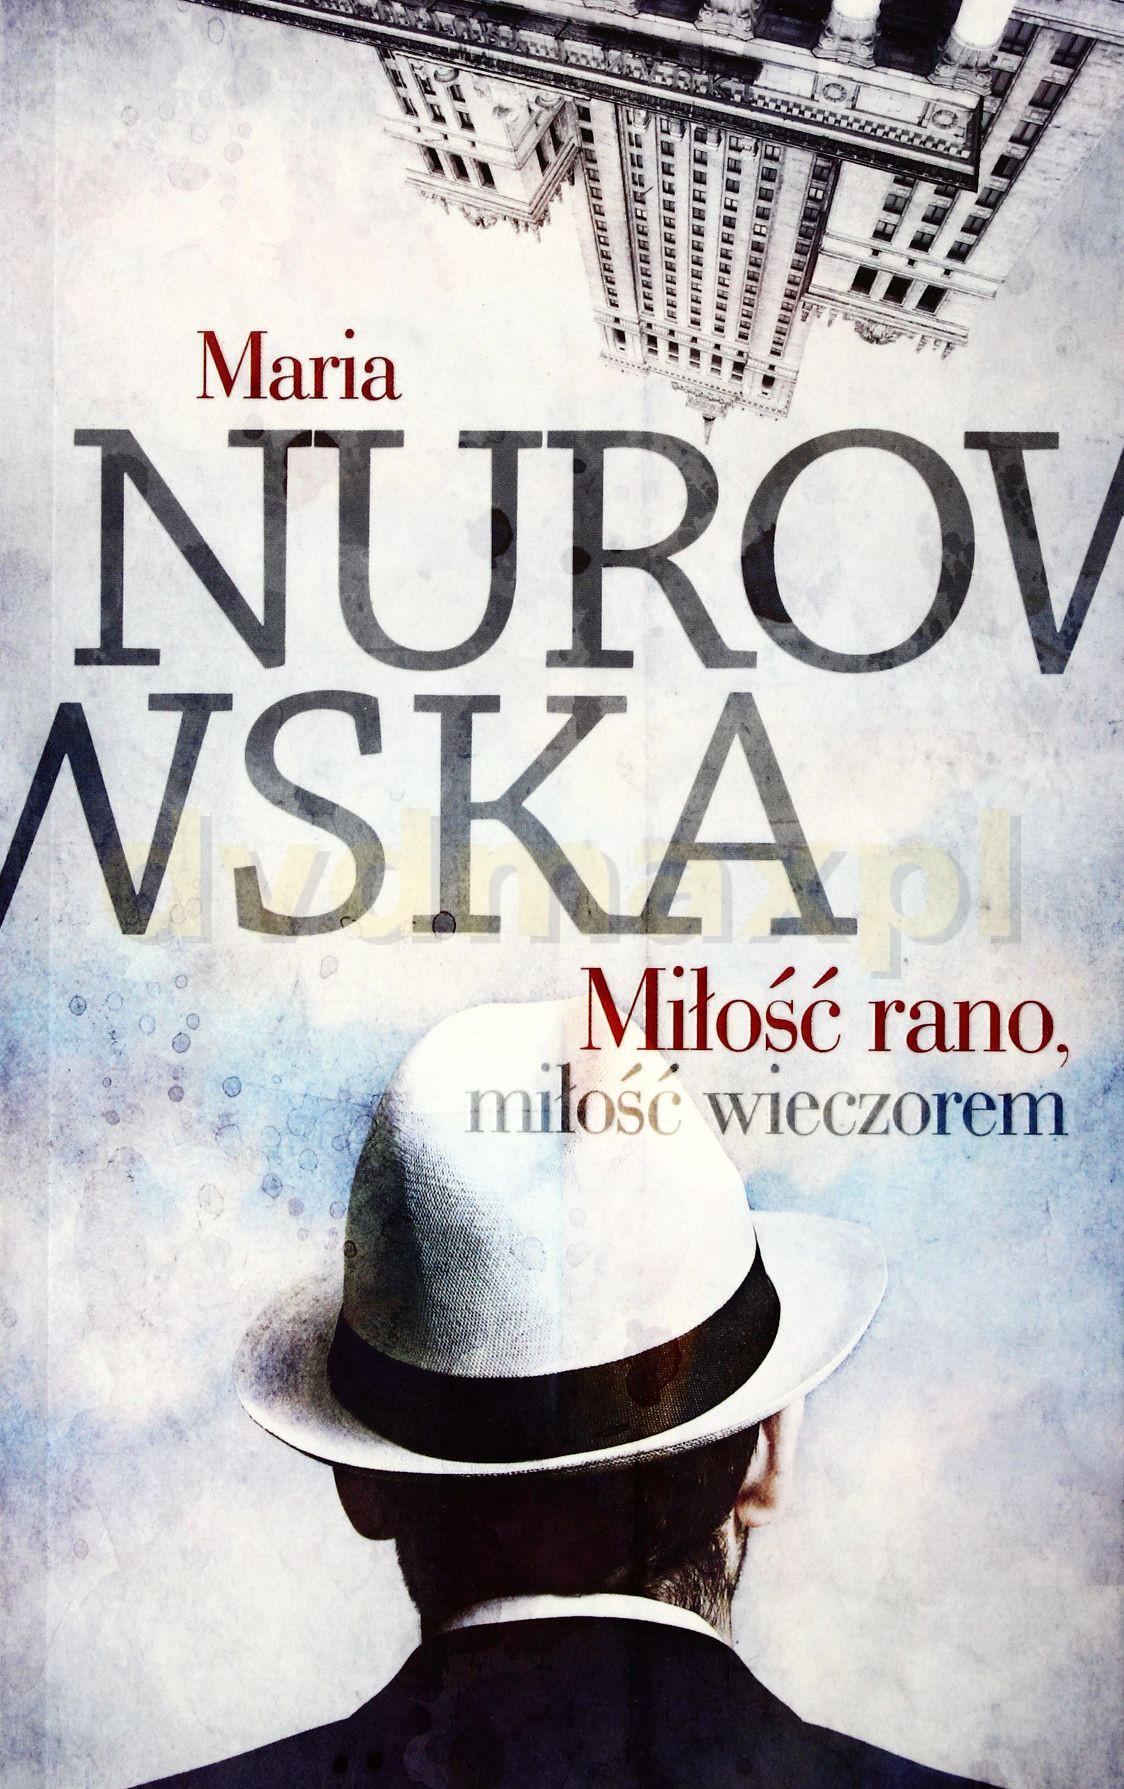 Miłość rano, miłość wieczorem - Nurowska Maria [KSIĄŻKA] - Nurowska Maria